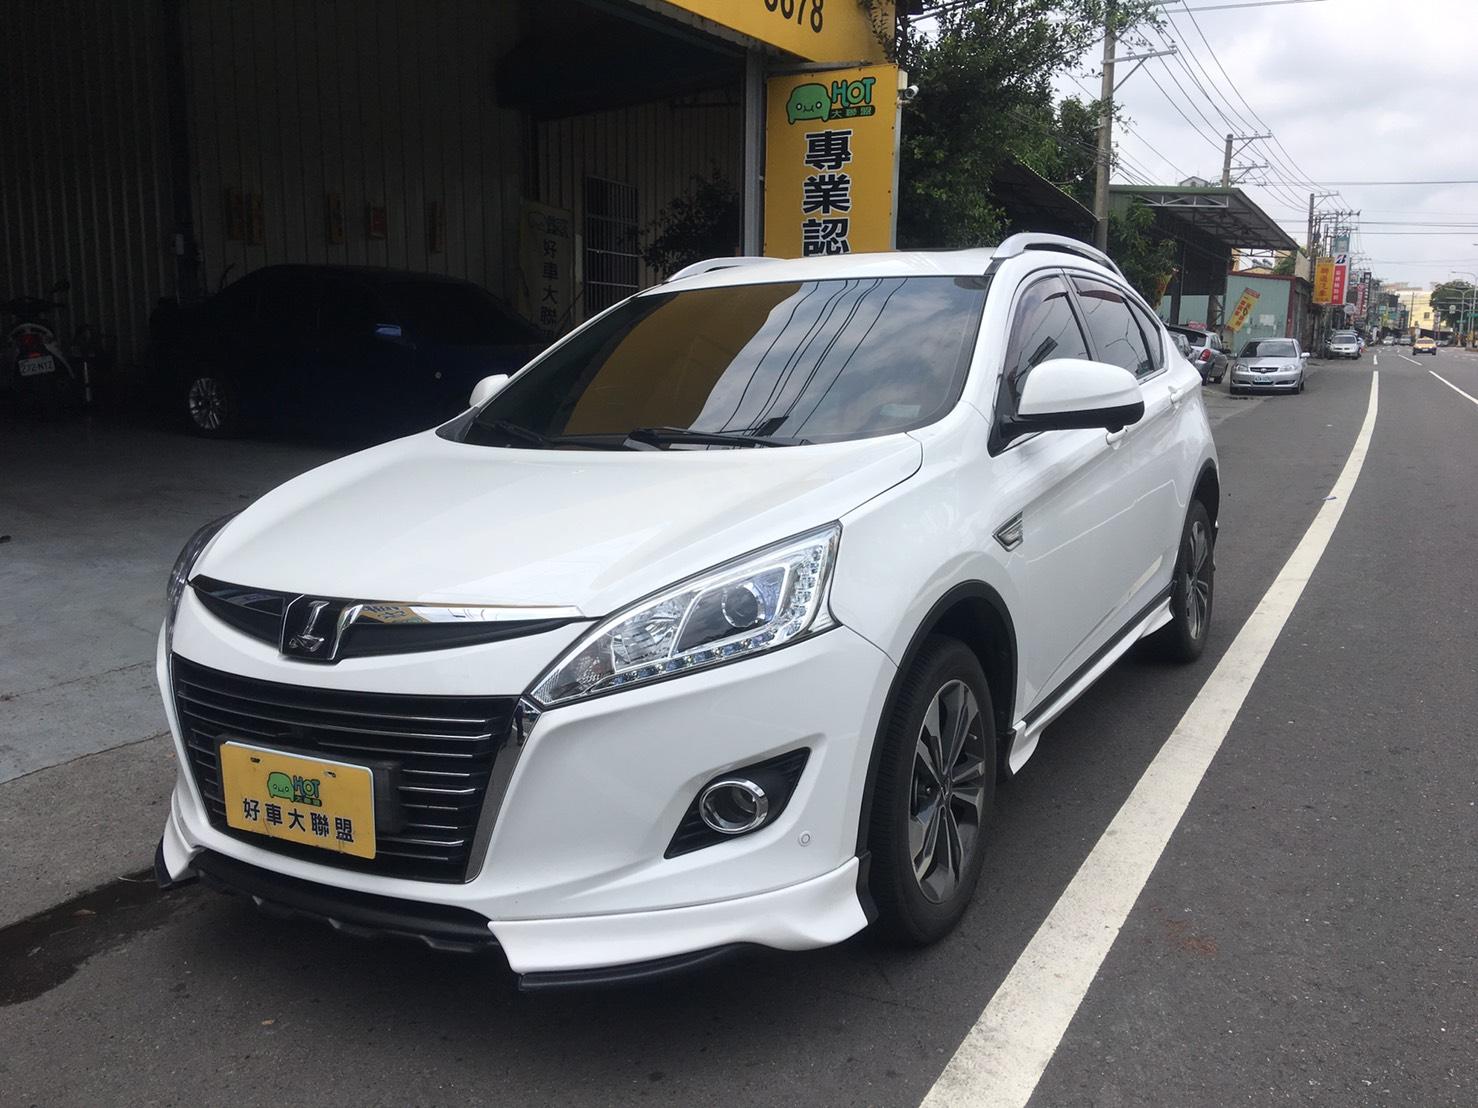 2017 Luxgen 納智捷 U6 Turbo